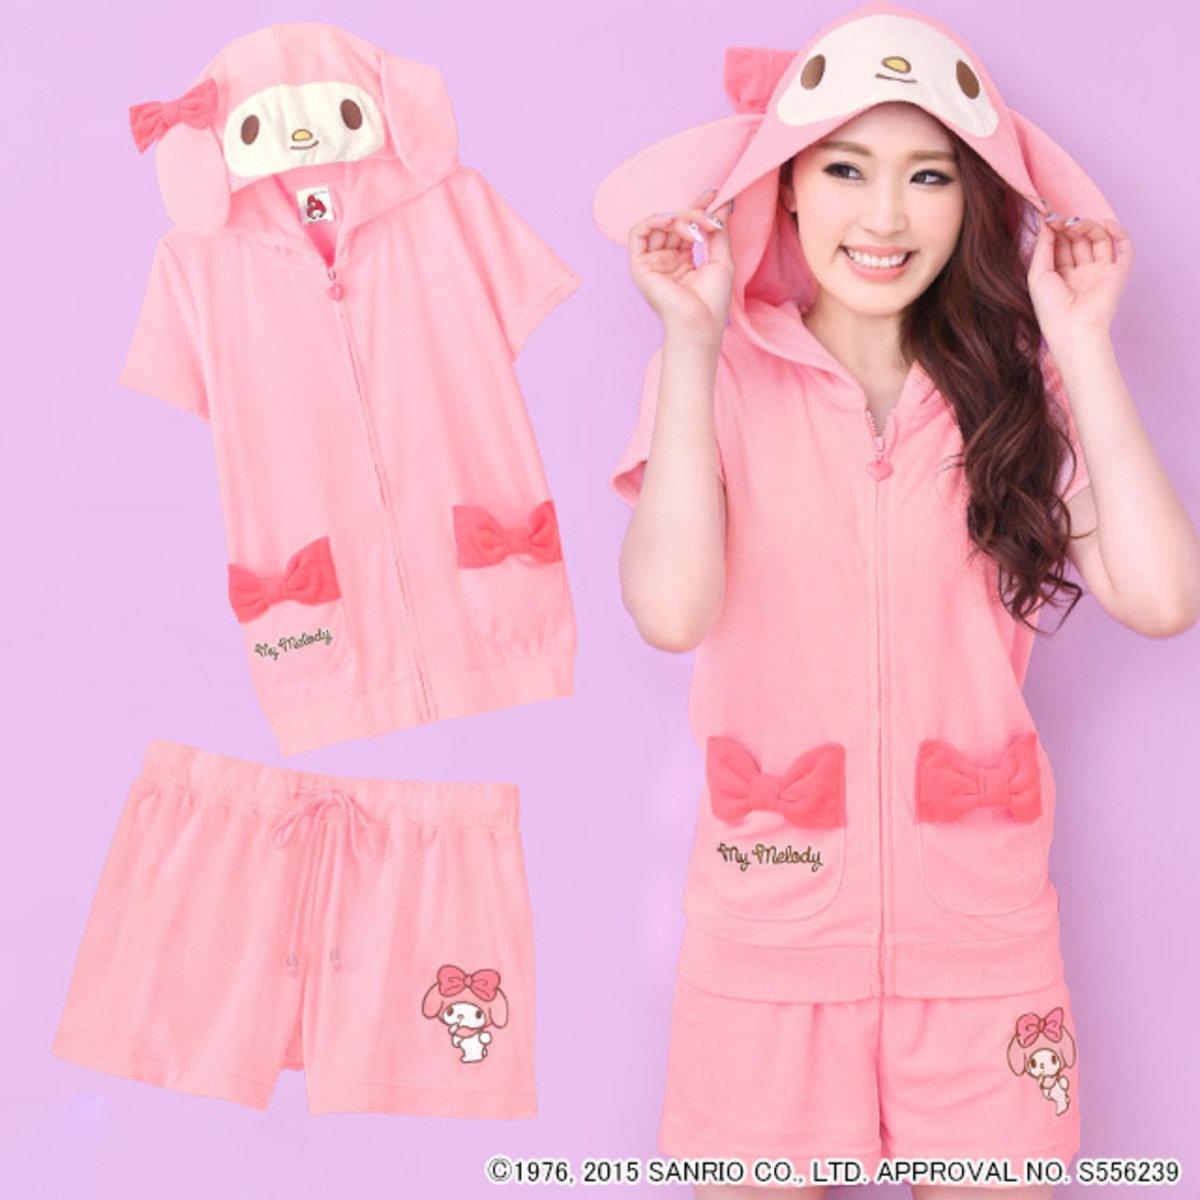 SANRIO Hello Kitty My Melody 外套短褲套裝 - 中碼